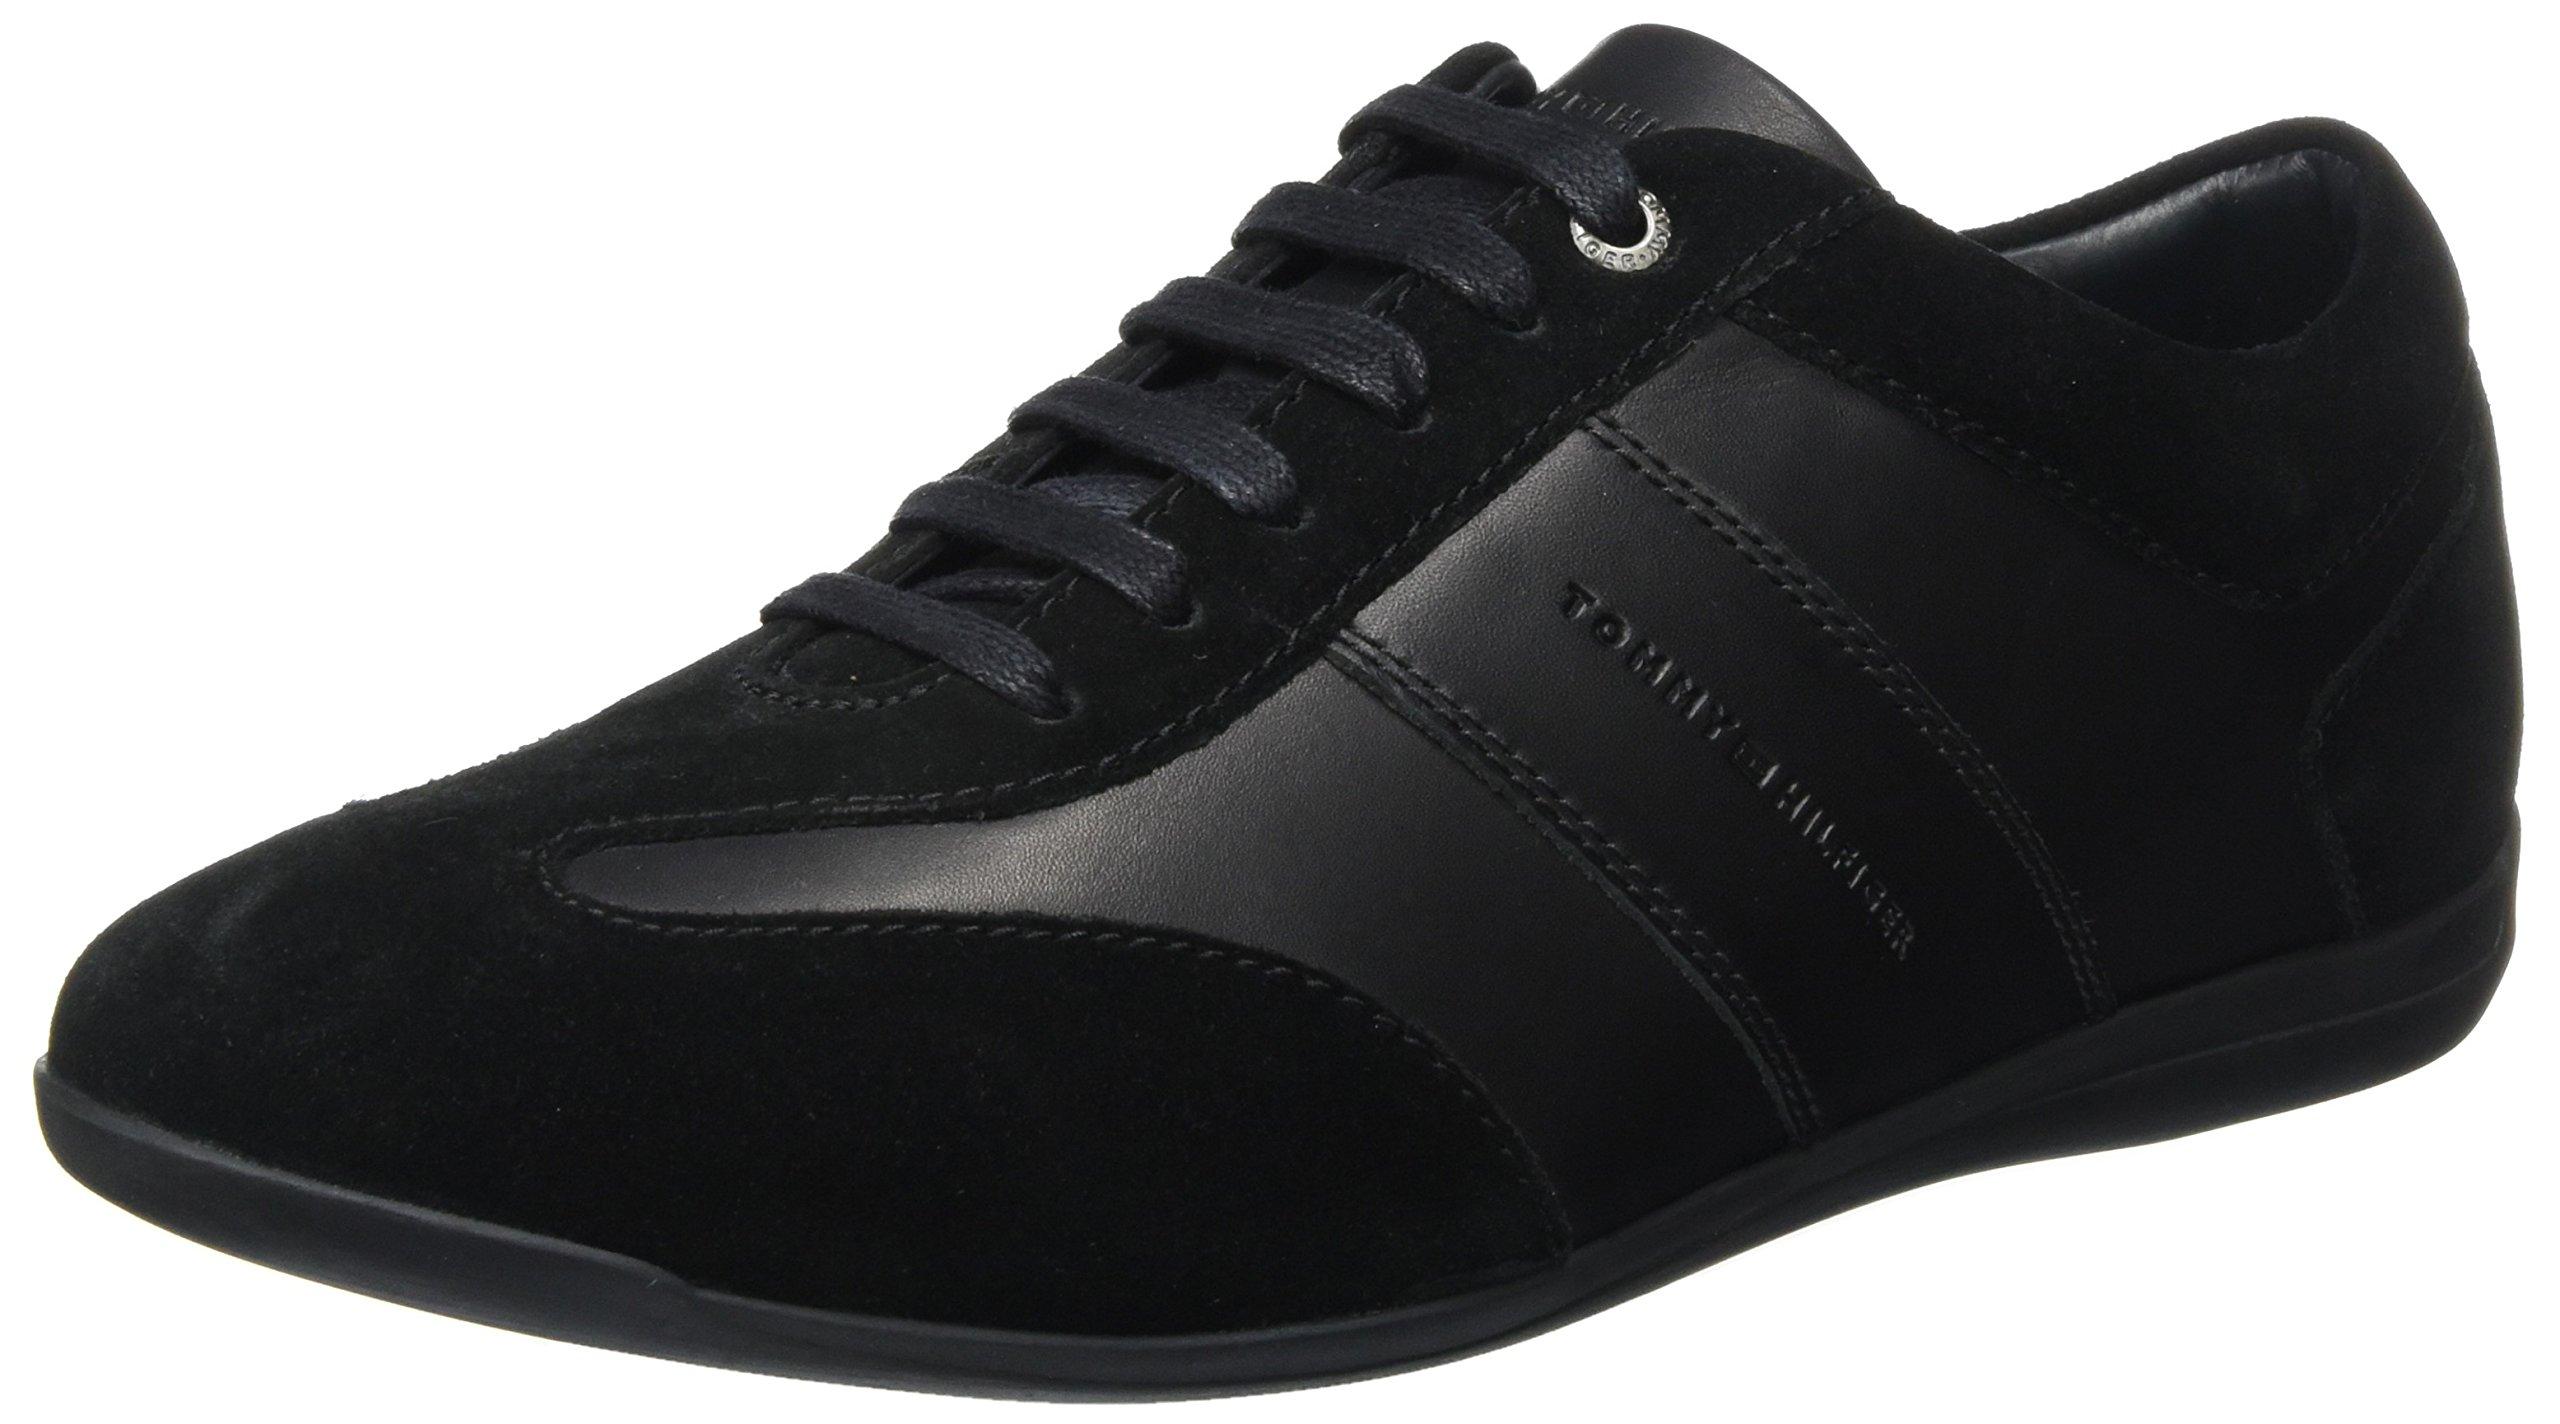 Tommy Hilfiger Men's O2285tis 1c Low-Top Sneakers